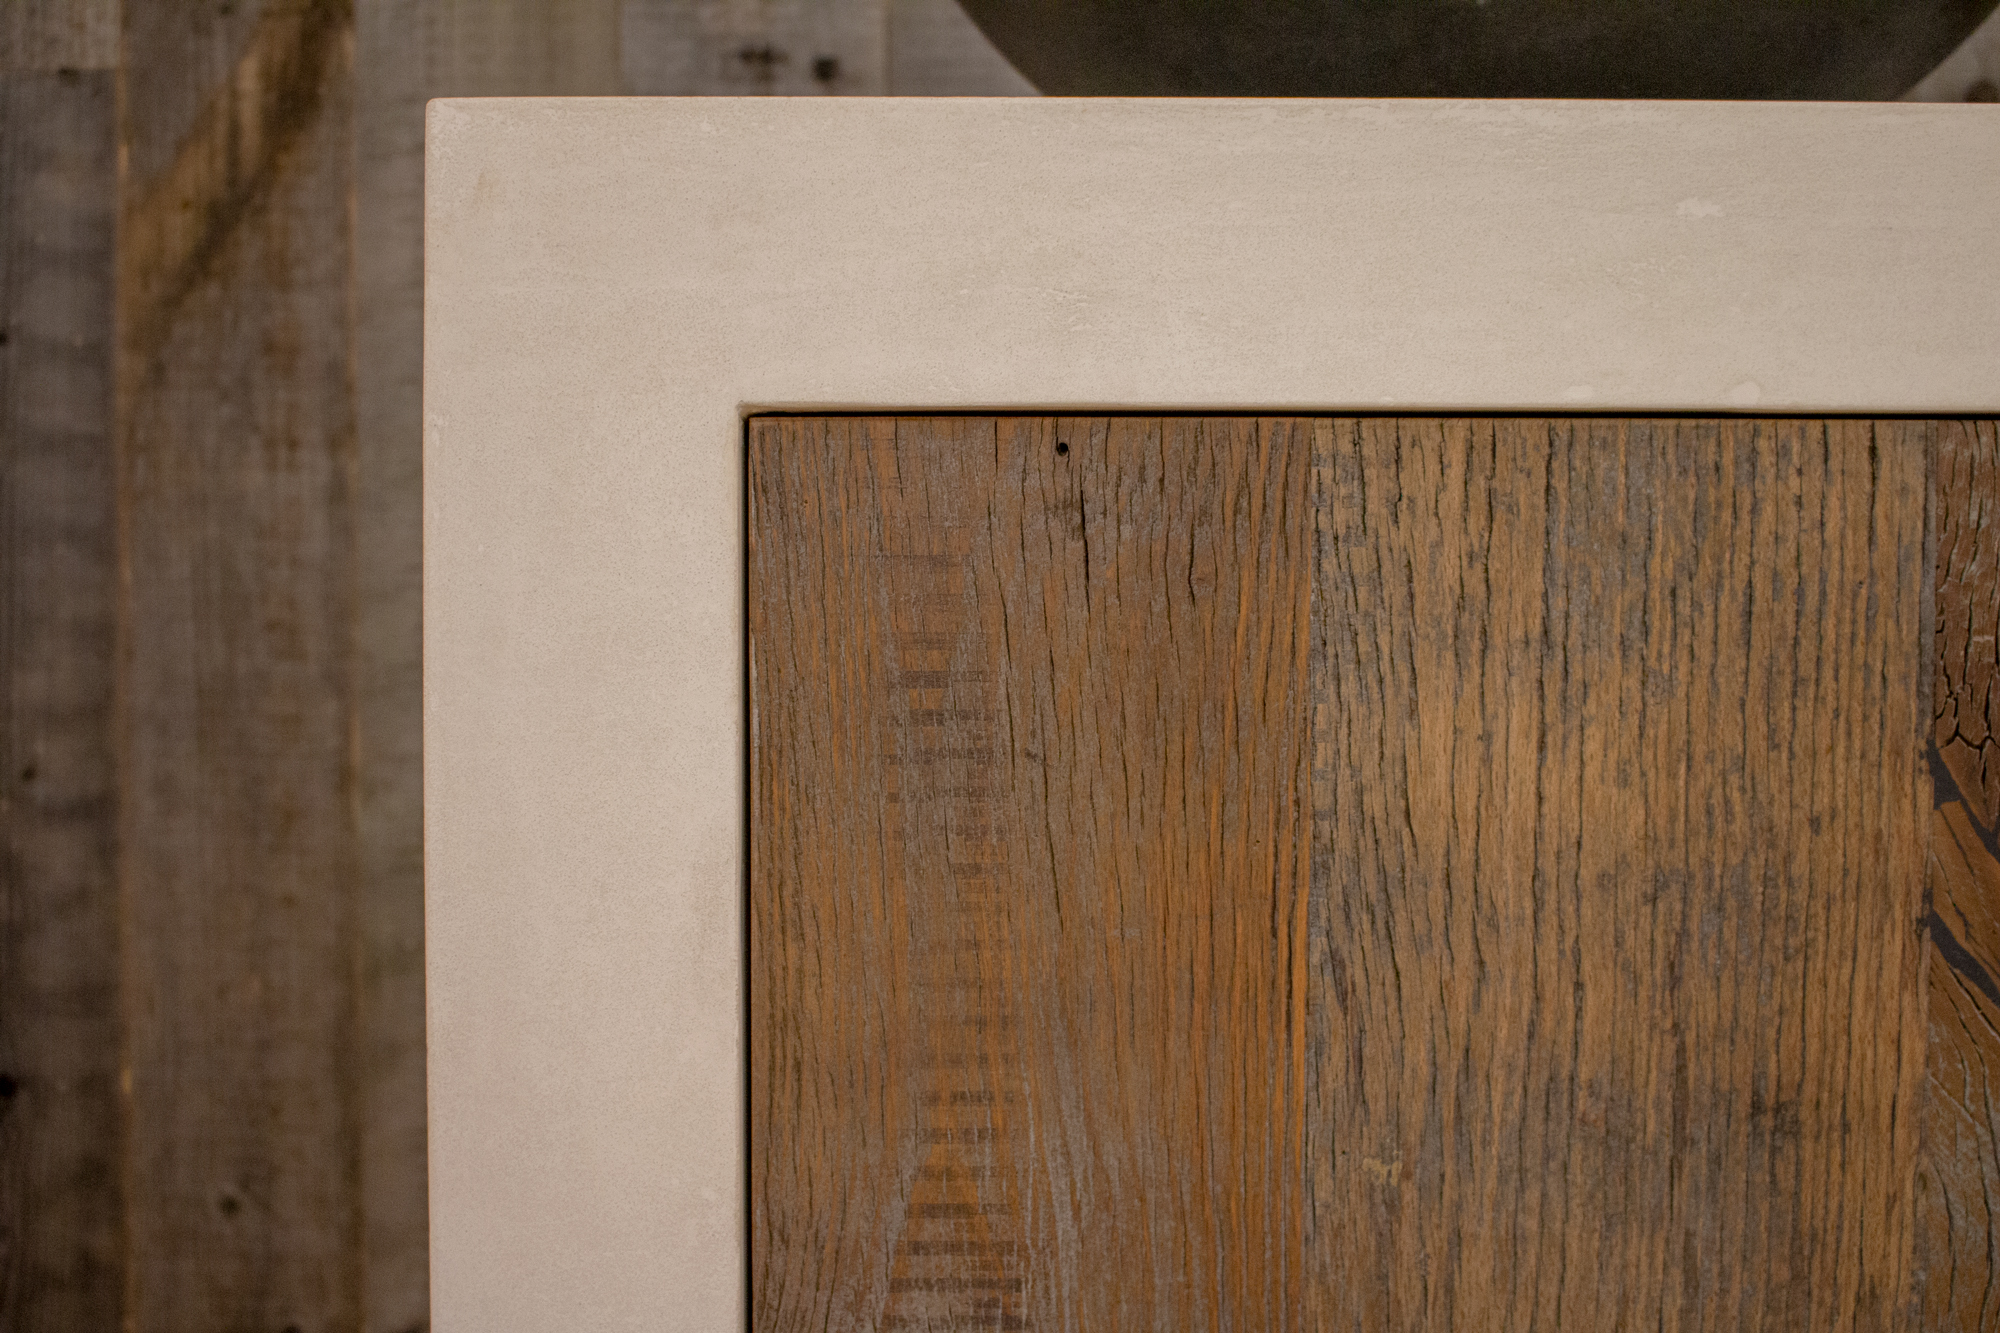 Concrete kitchen unit with reclaimed wood door